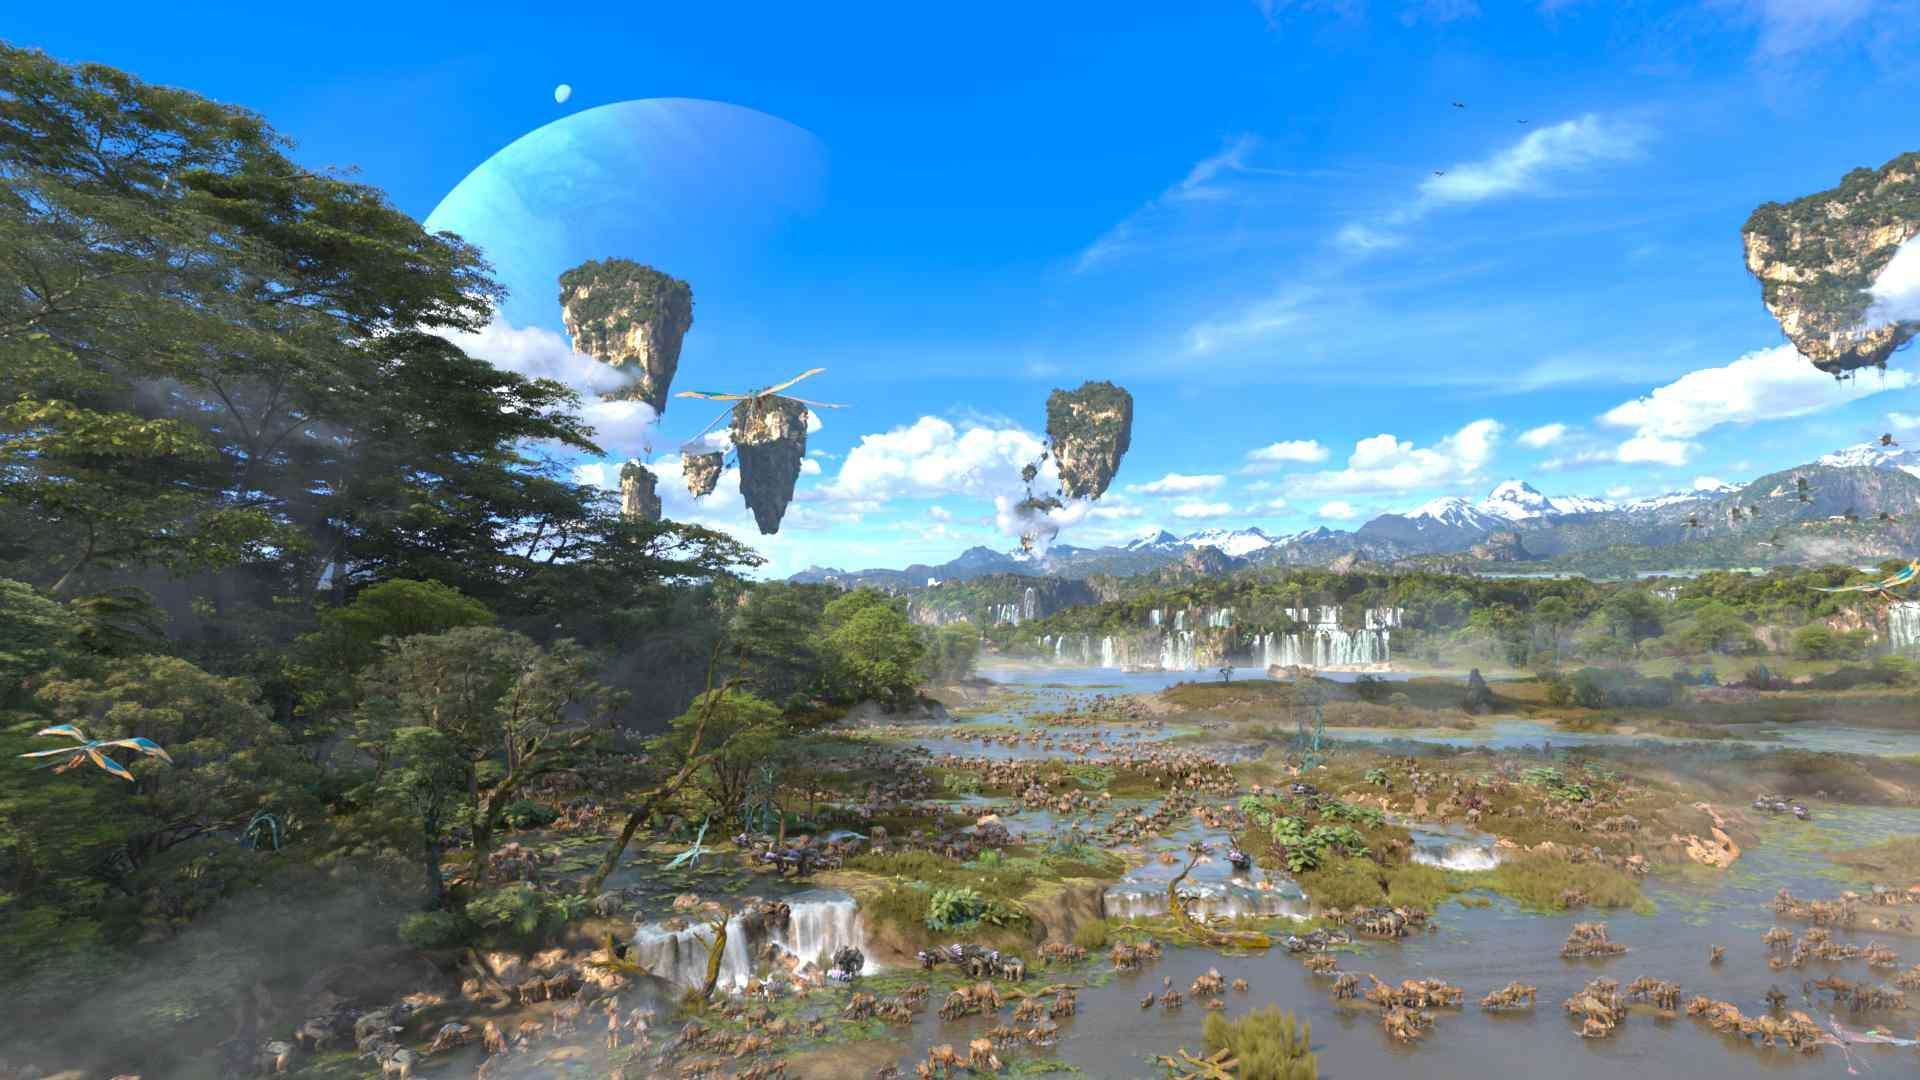 Avatar Flight of Passage Disney World